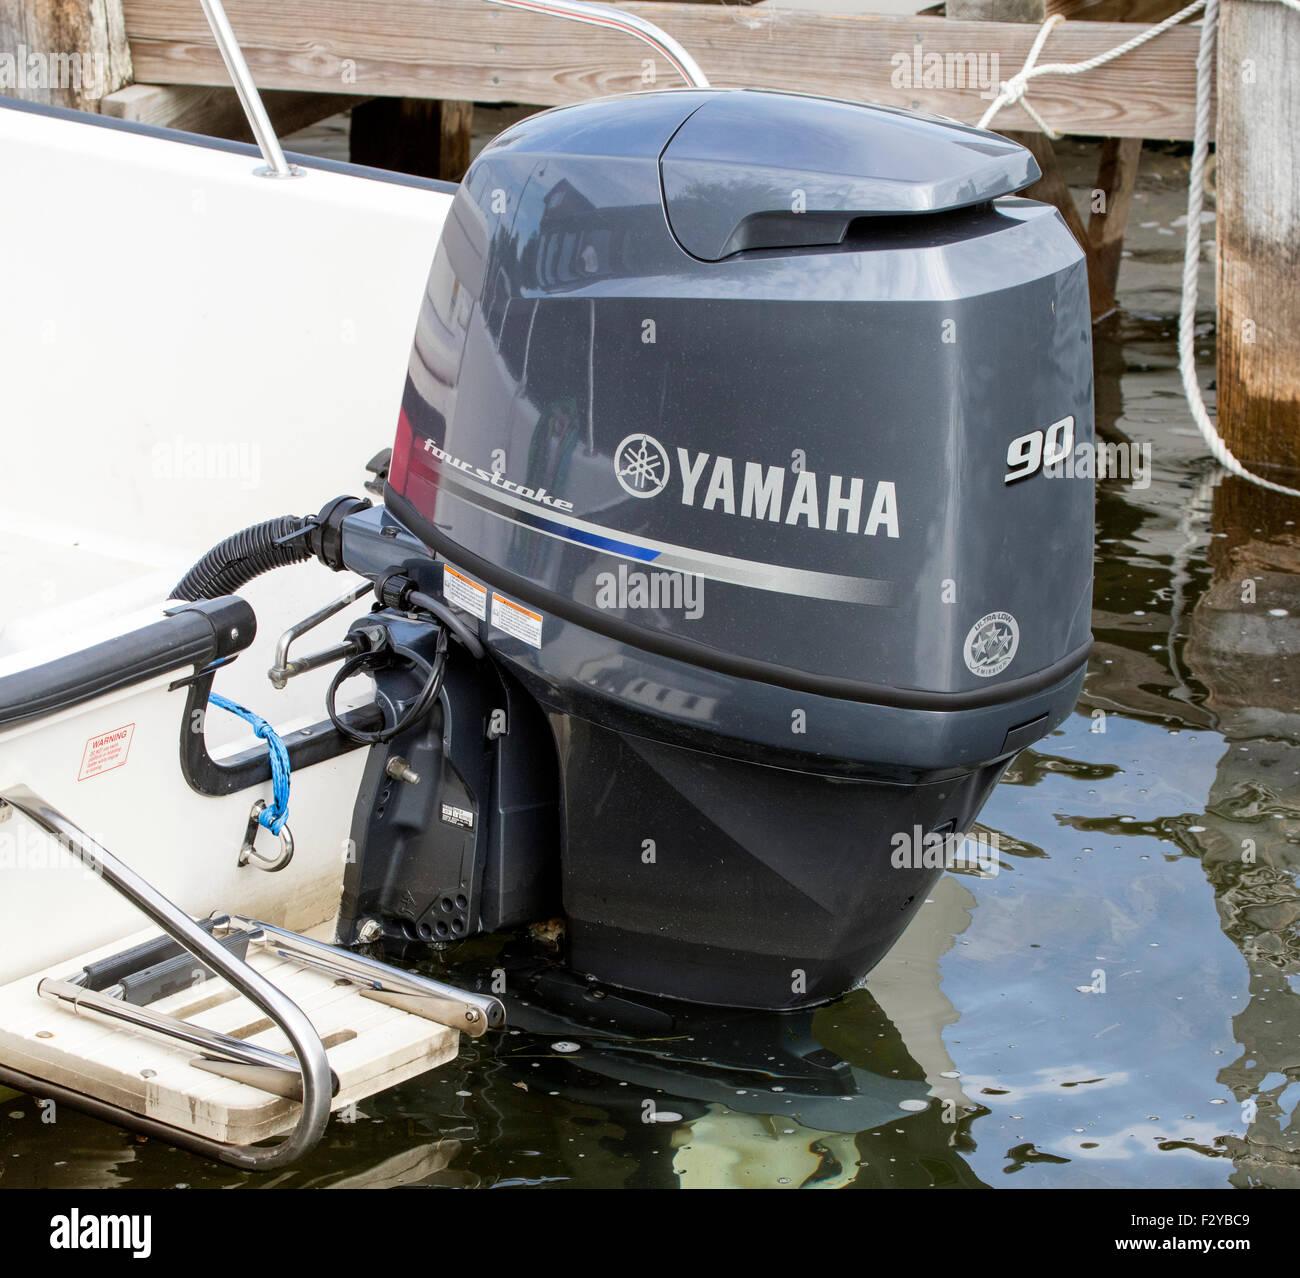 yamaha four stroke outboard manual